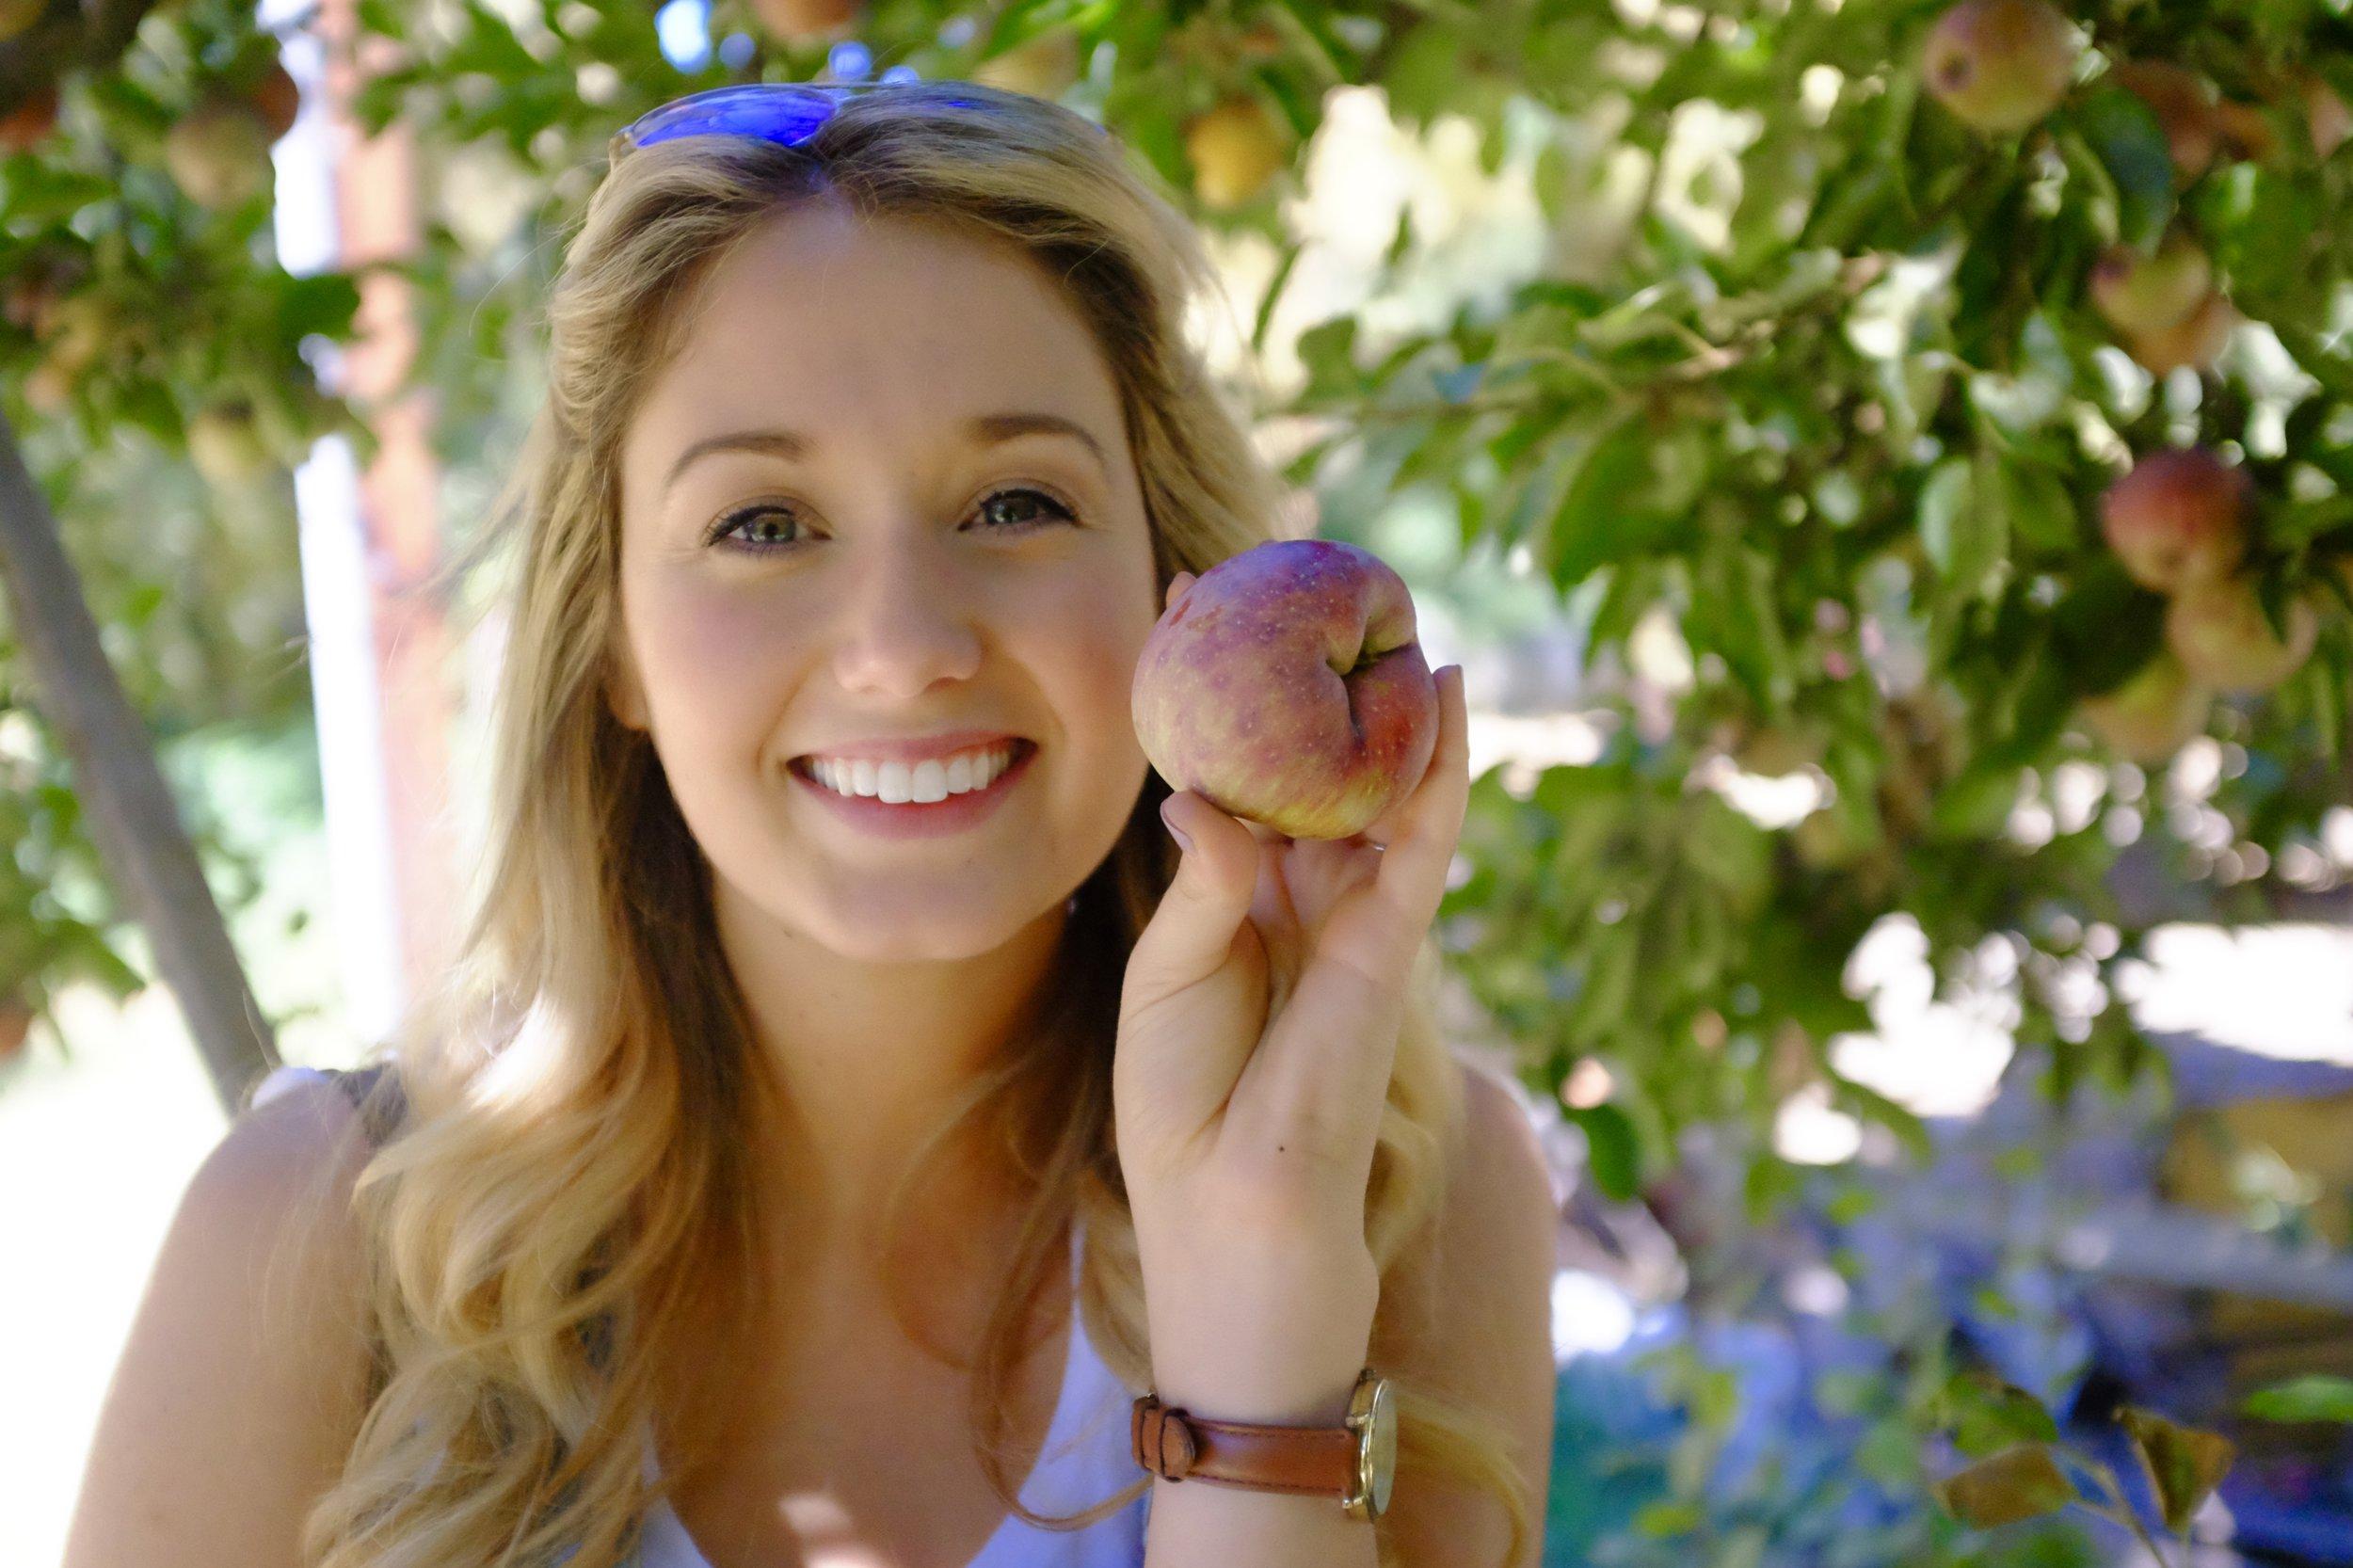 Apple Picking at Riley's Apple Farm, Yucaipa CA | Kaci Nicole